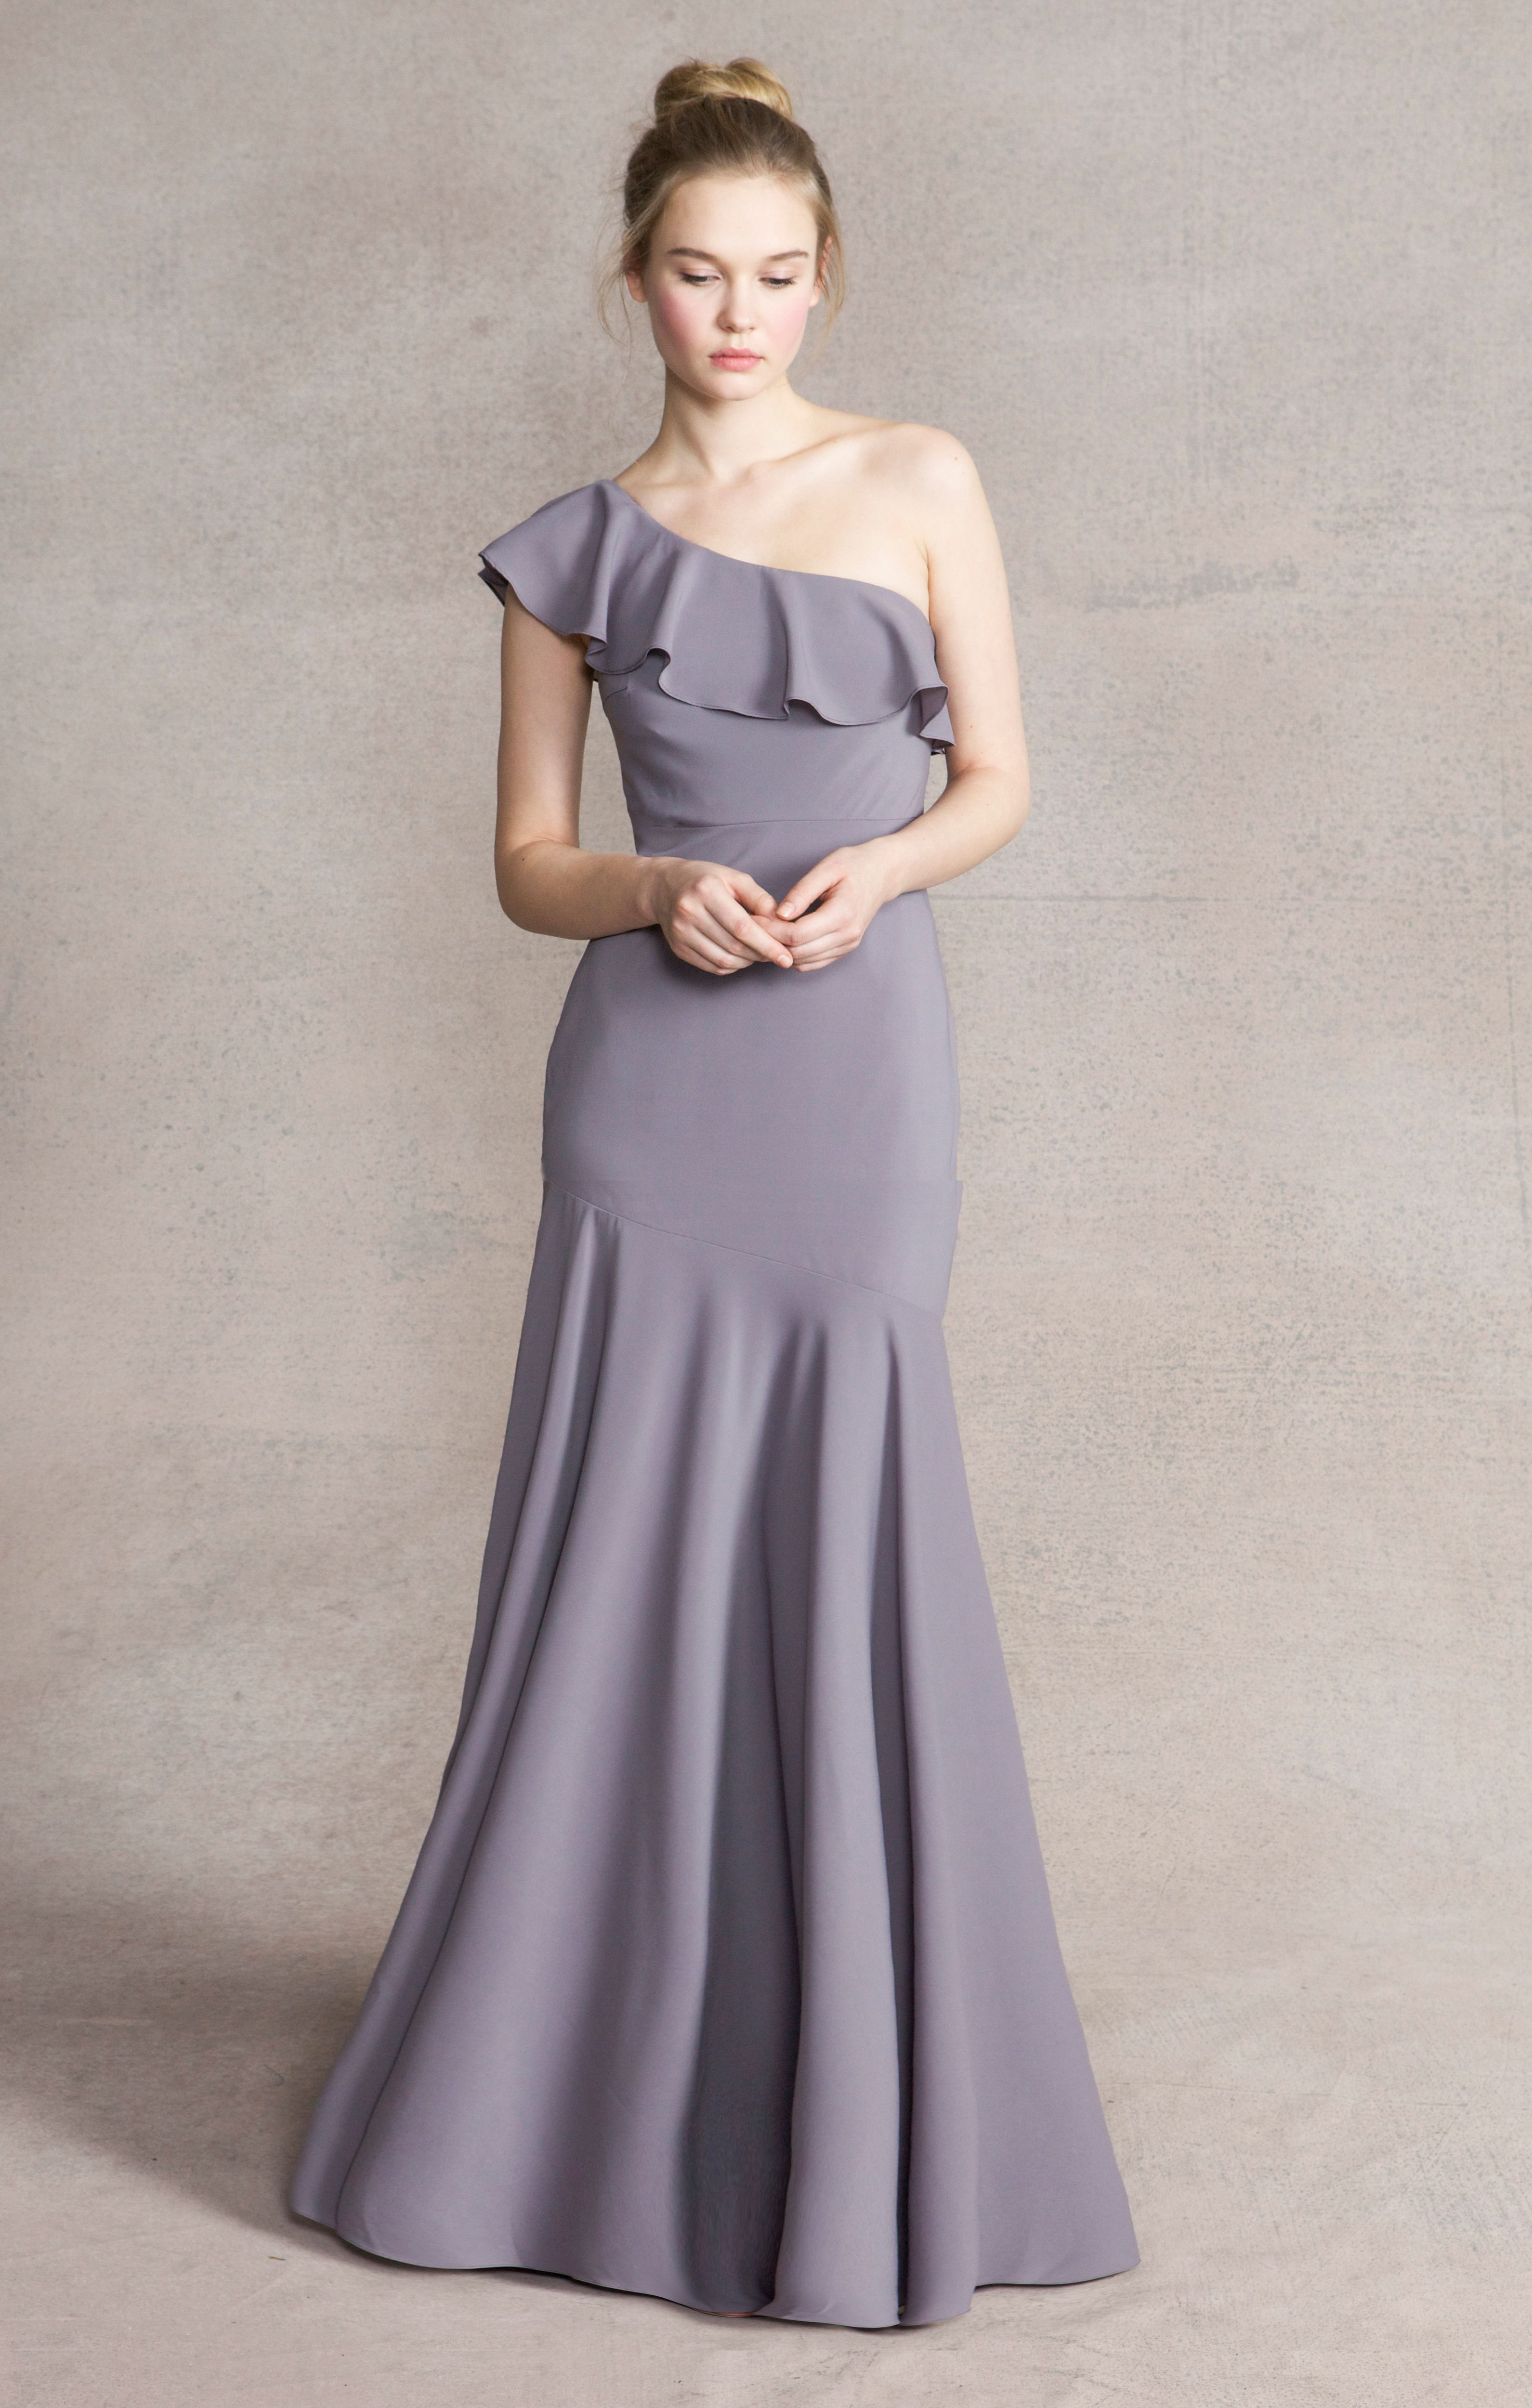 6a041576623 Bridesmaid Dress  Jenny Yoo AInsley Dress in Crepe De Chine ...